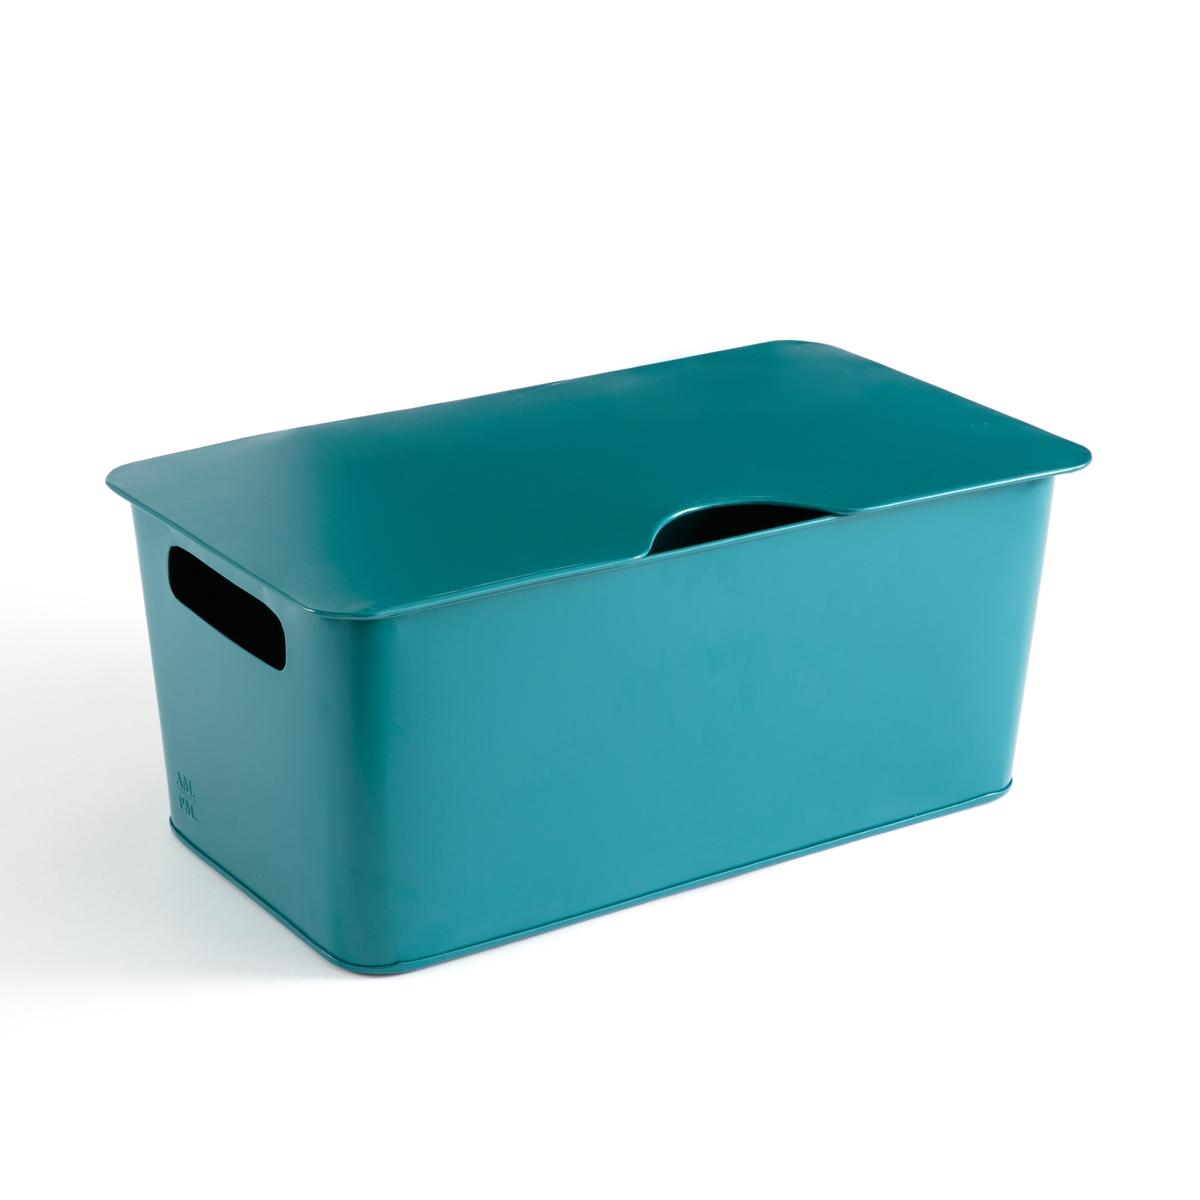 Ящик LaRedoute La Redoute единый размер синий пуф la redoute из шерсти carito единый размер серый